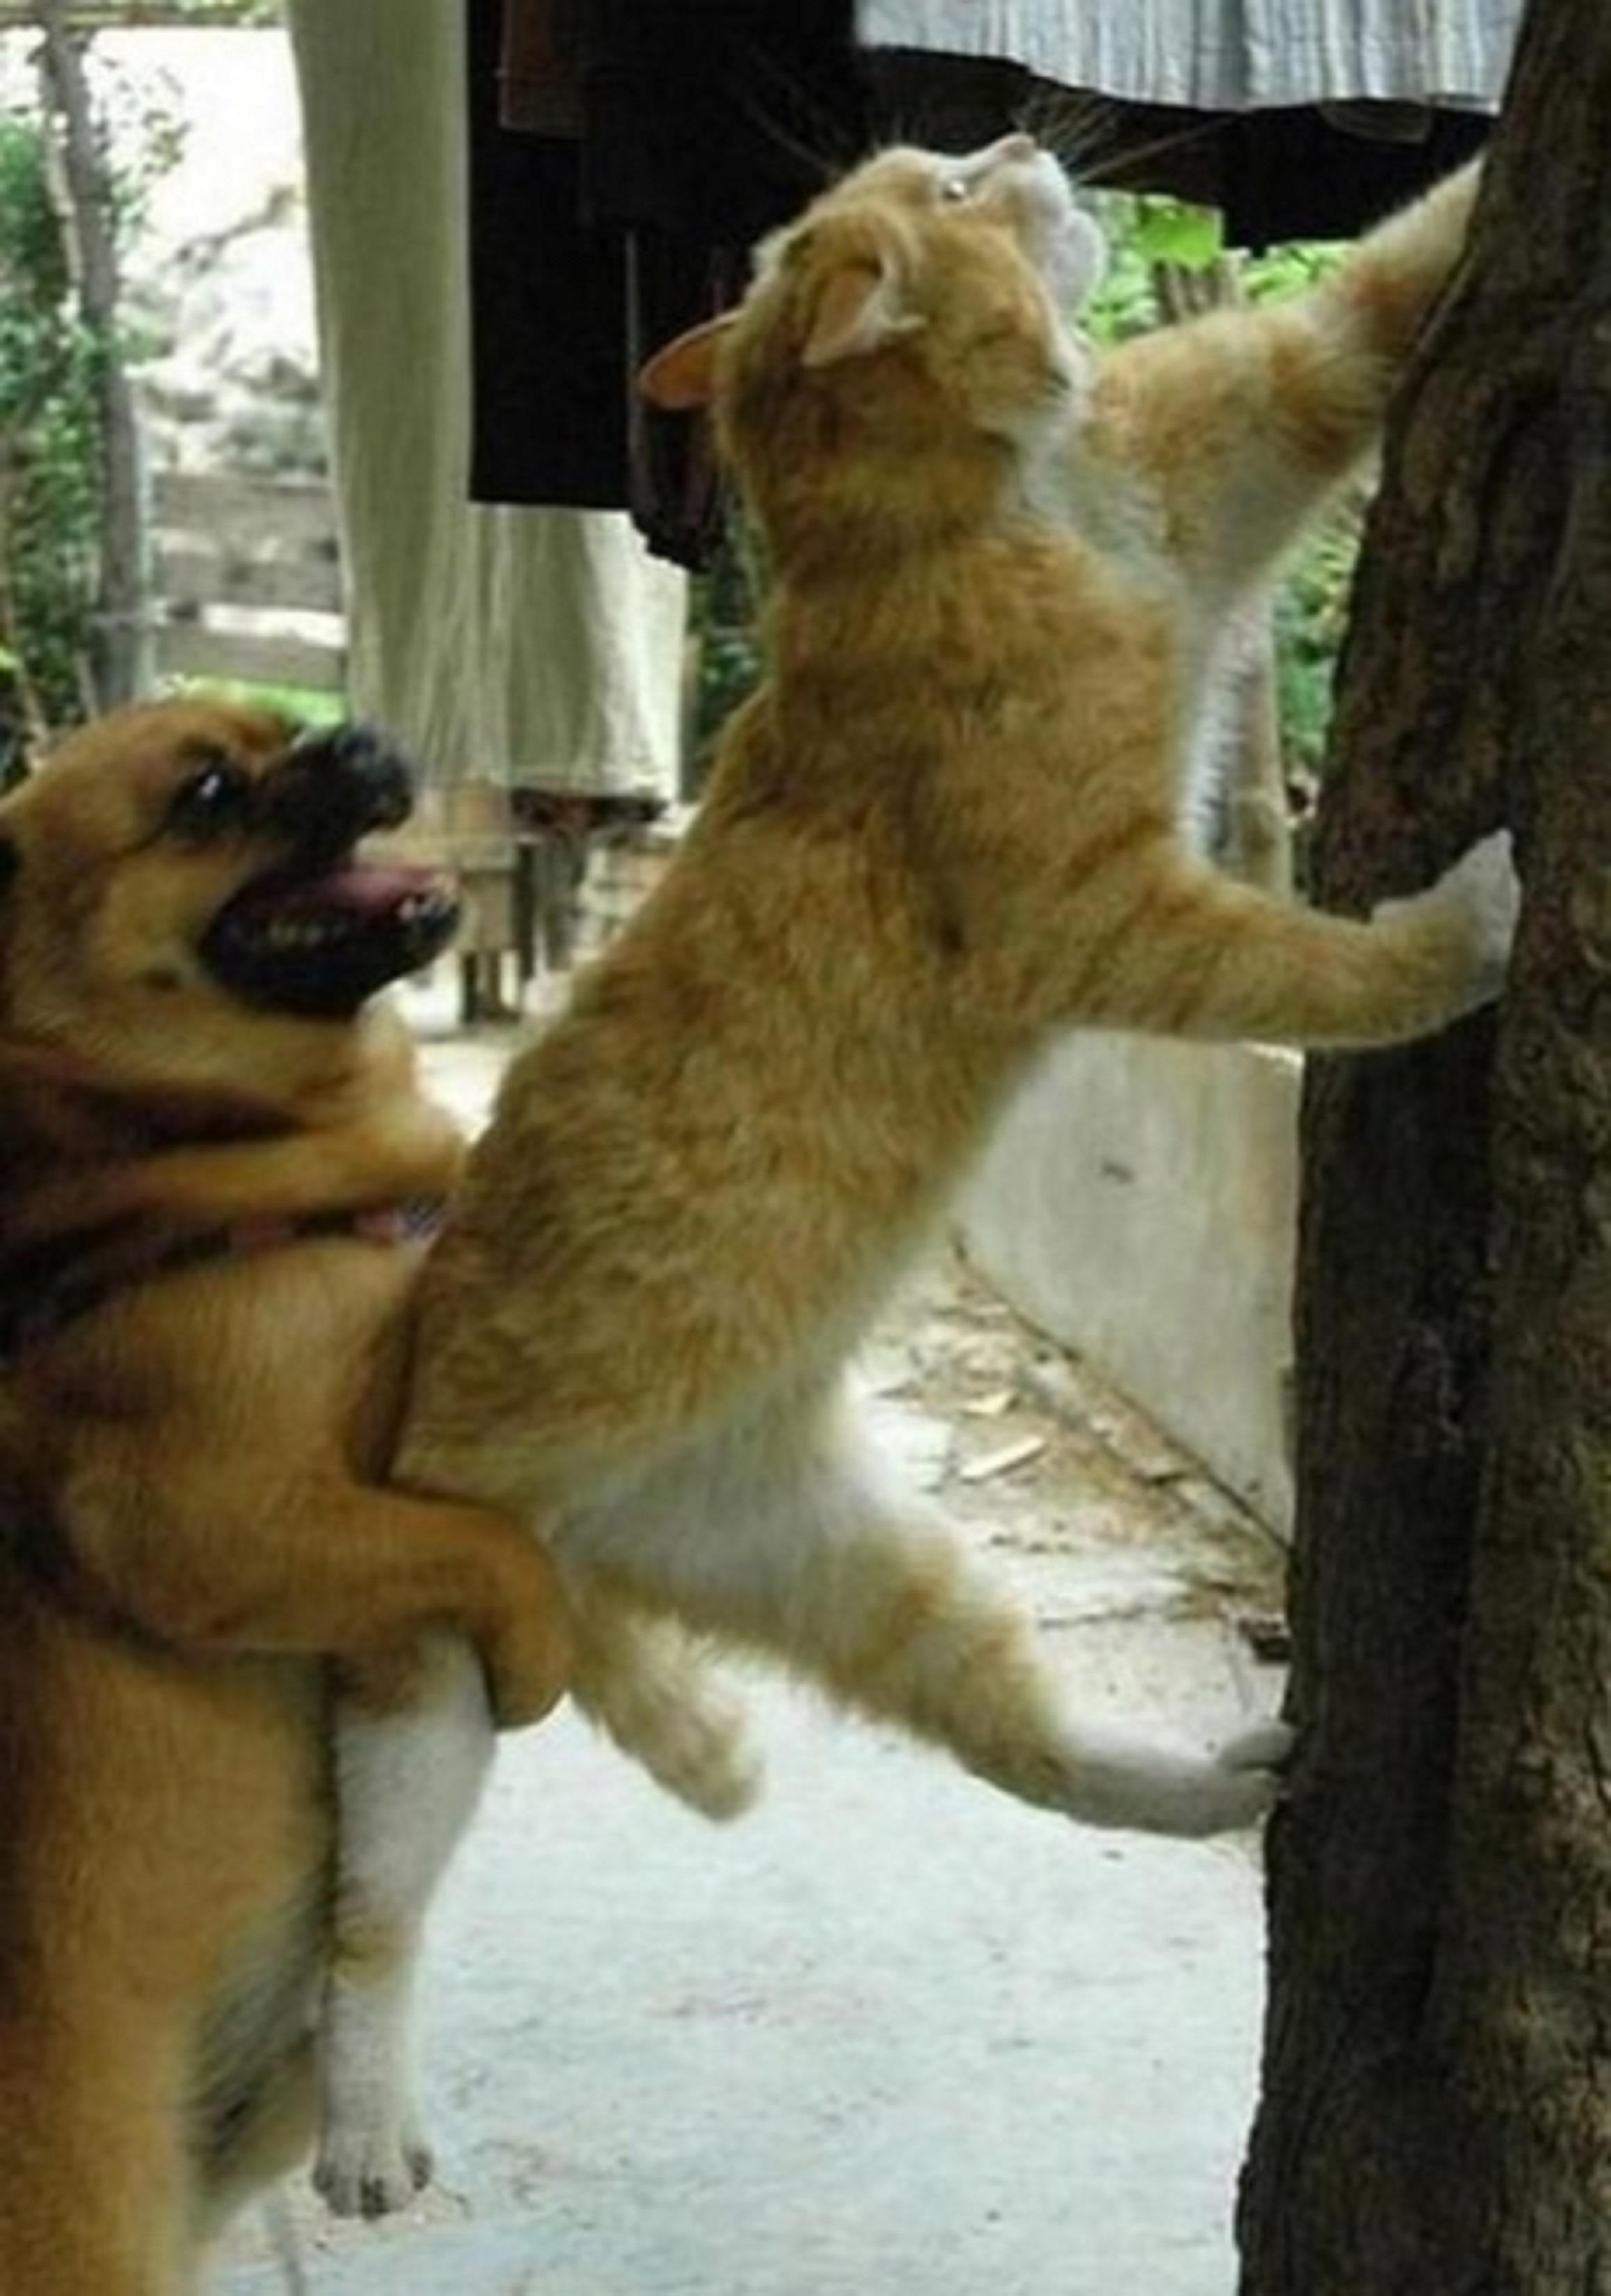 Httpwwwlaughsparkinfouploadsfunny Dog Helping Cat 635808189889180351 17663